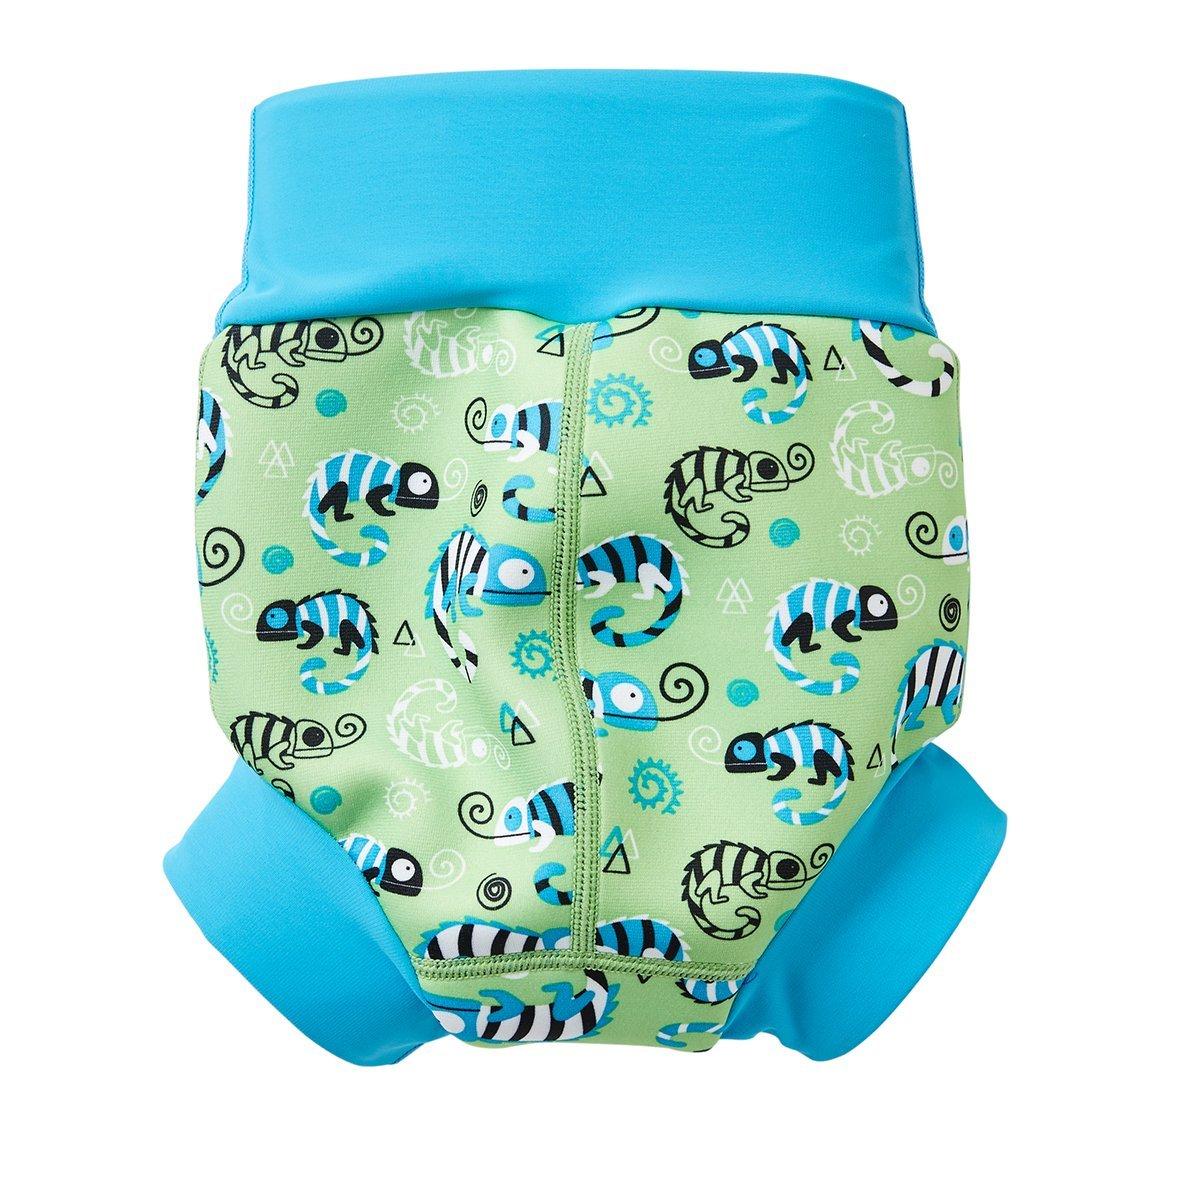 Splash-About-Happy-Nappy-Baby-amp-Toddler-Swimwear-Nappy-and-Shorts-Sun-Safe thumbnail 16